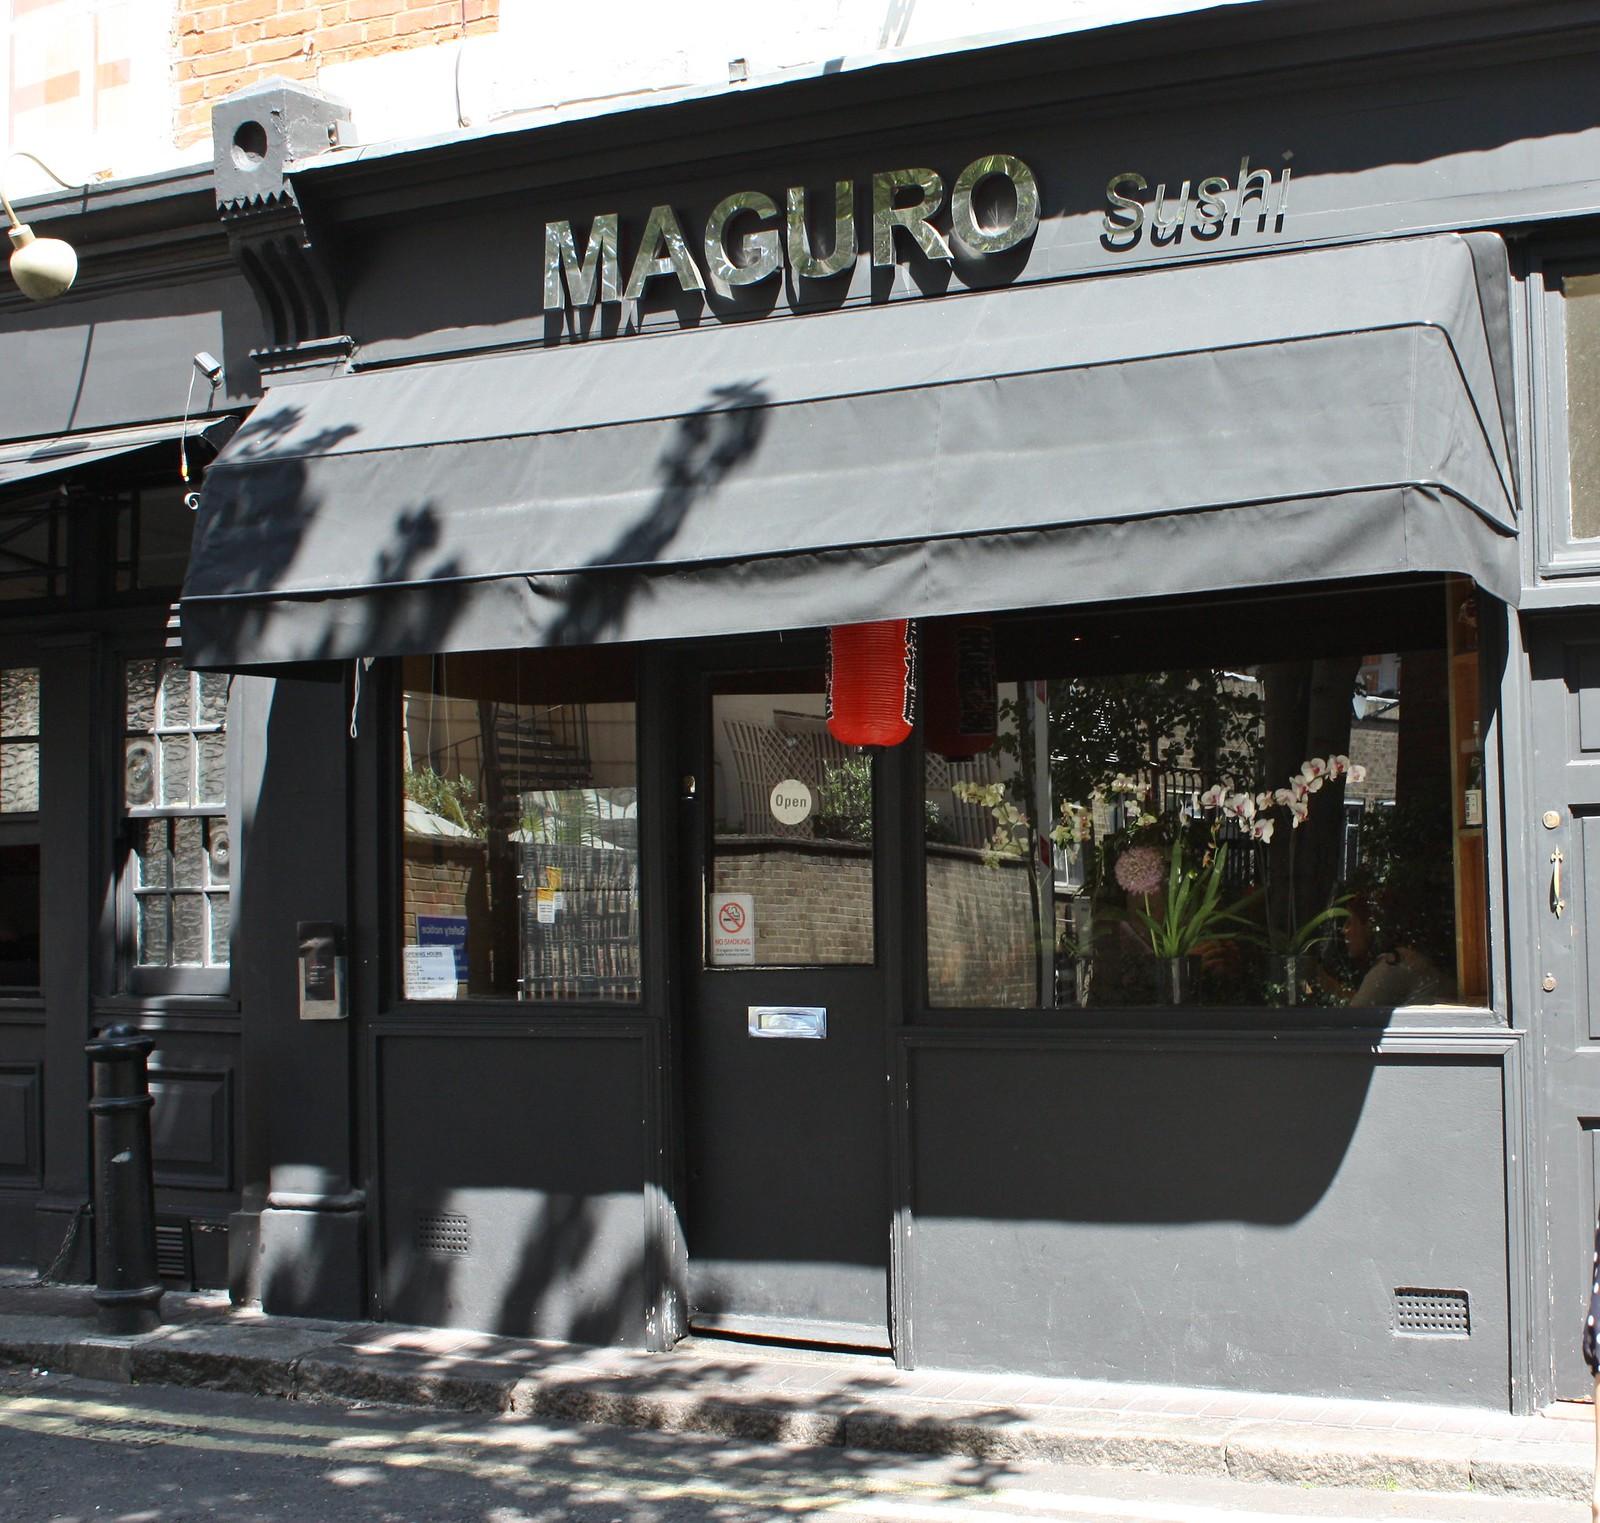 Maguros